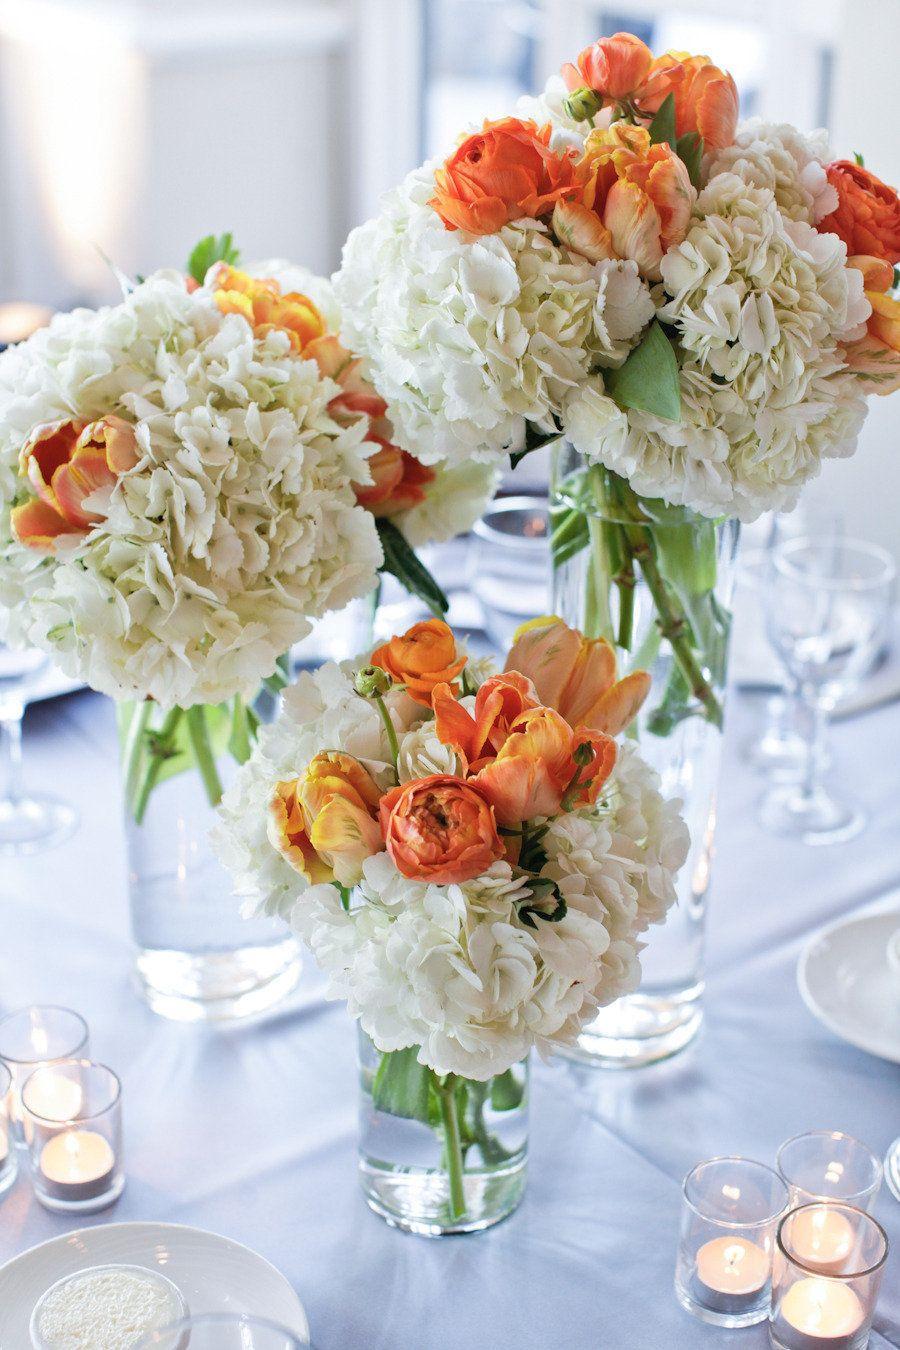 Orange and white floral centrepiece